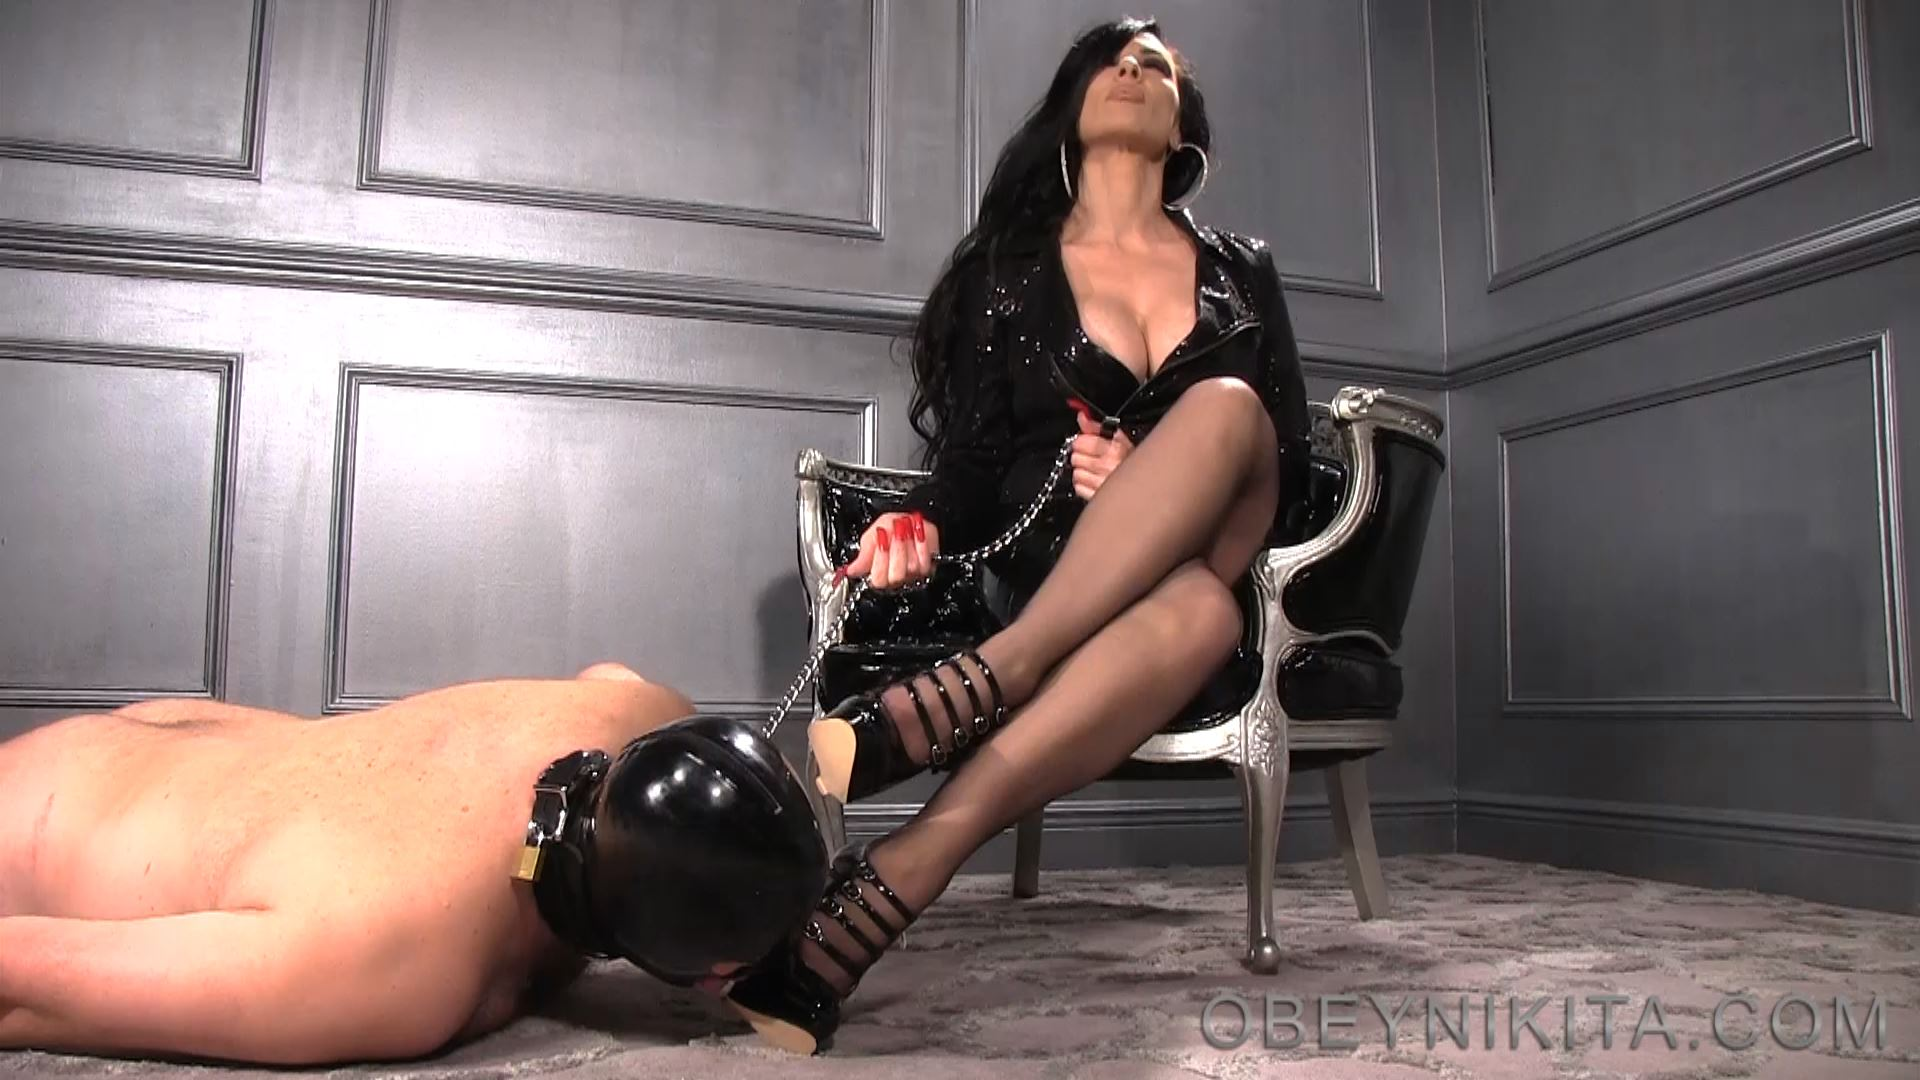 Mistress Nikita In Scene: Worship My Shiny Wedges - OBEYNIKITA - FULL HD/1080p/MP4